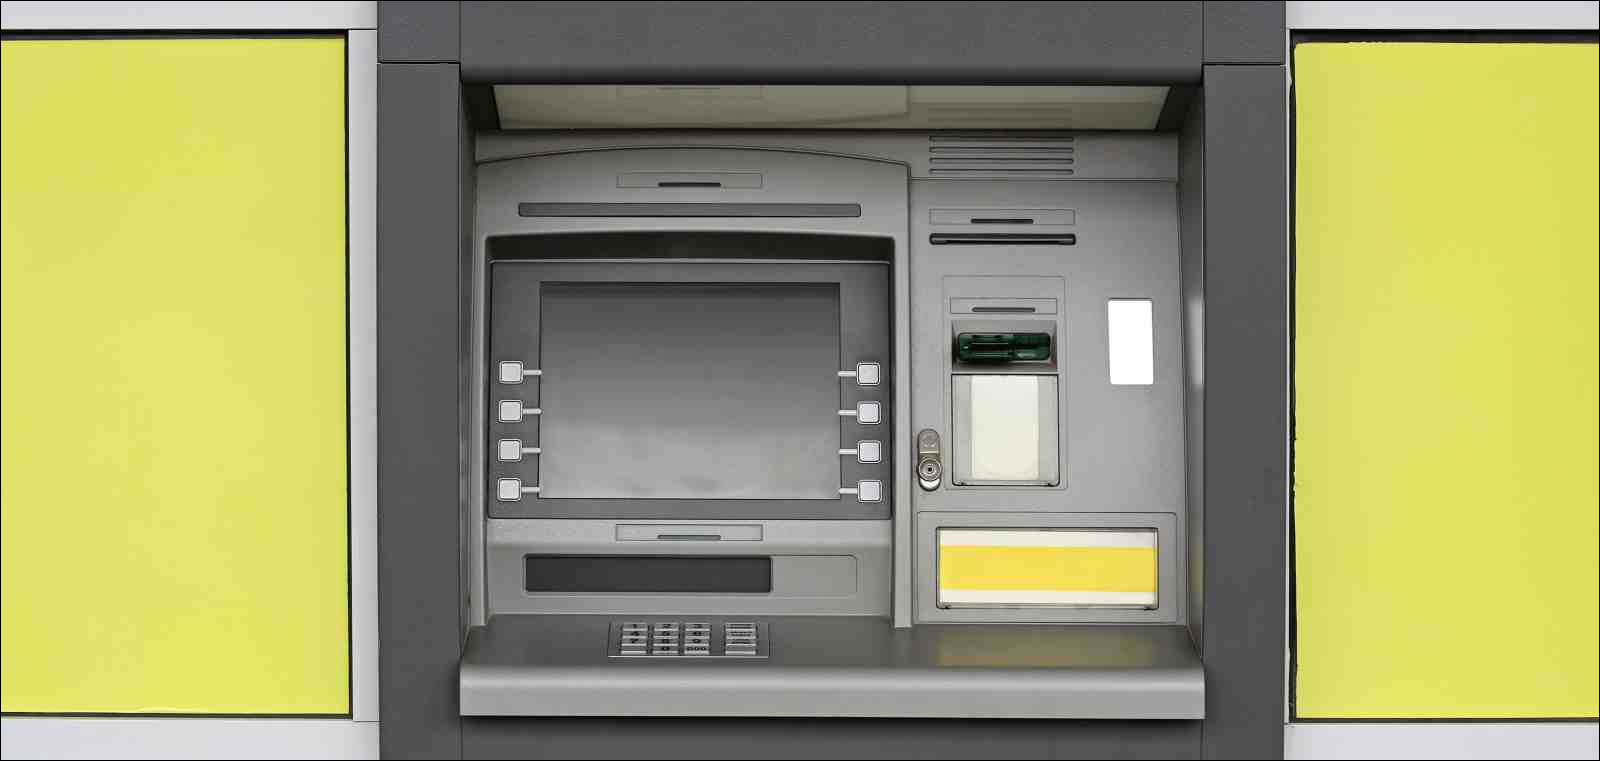 Automated Teller Machine Bank at Yellow Wall